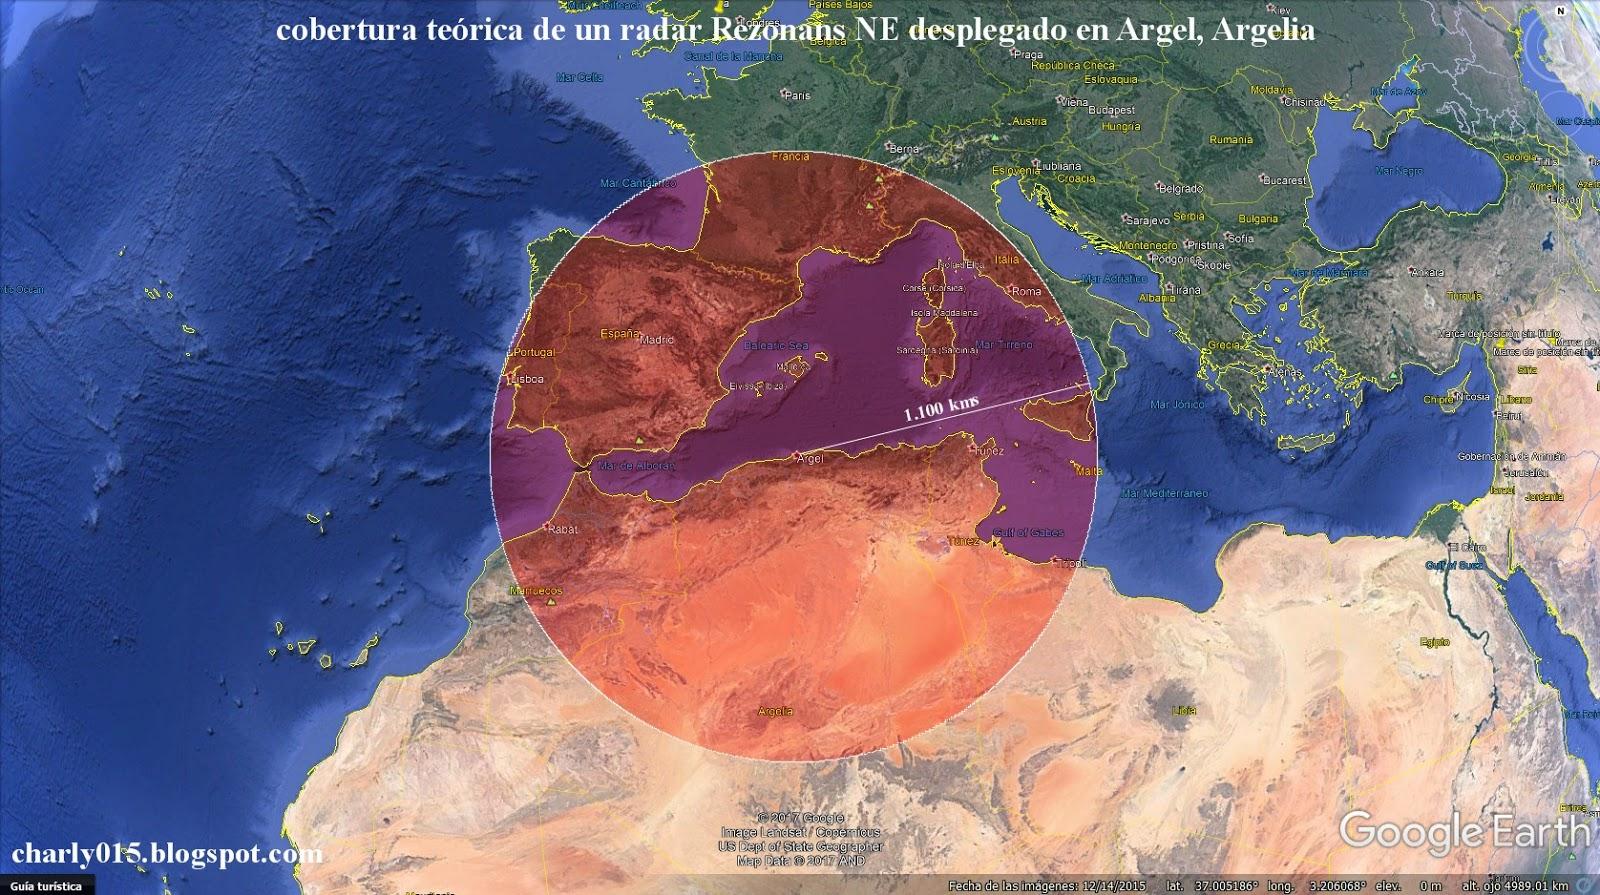 argelia%2Bradar%2Brezonans%2Bne.jpg